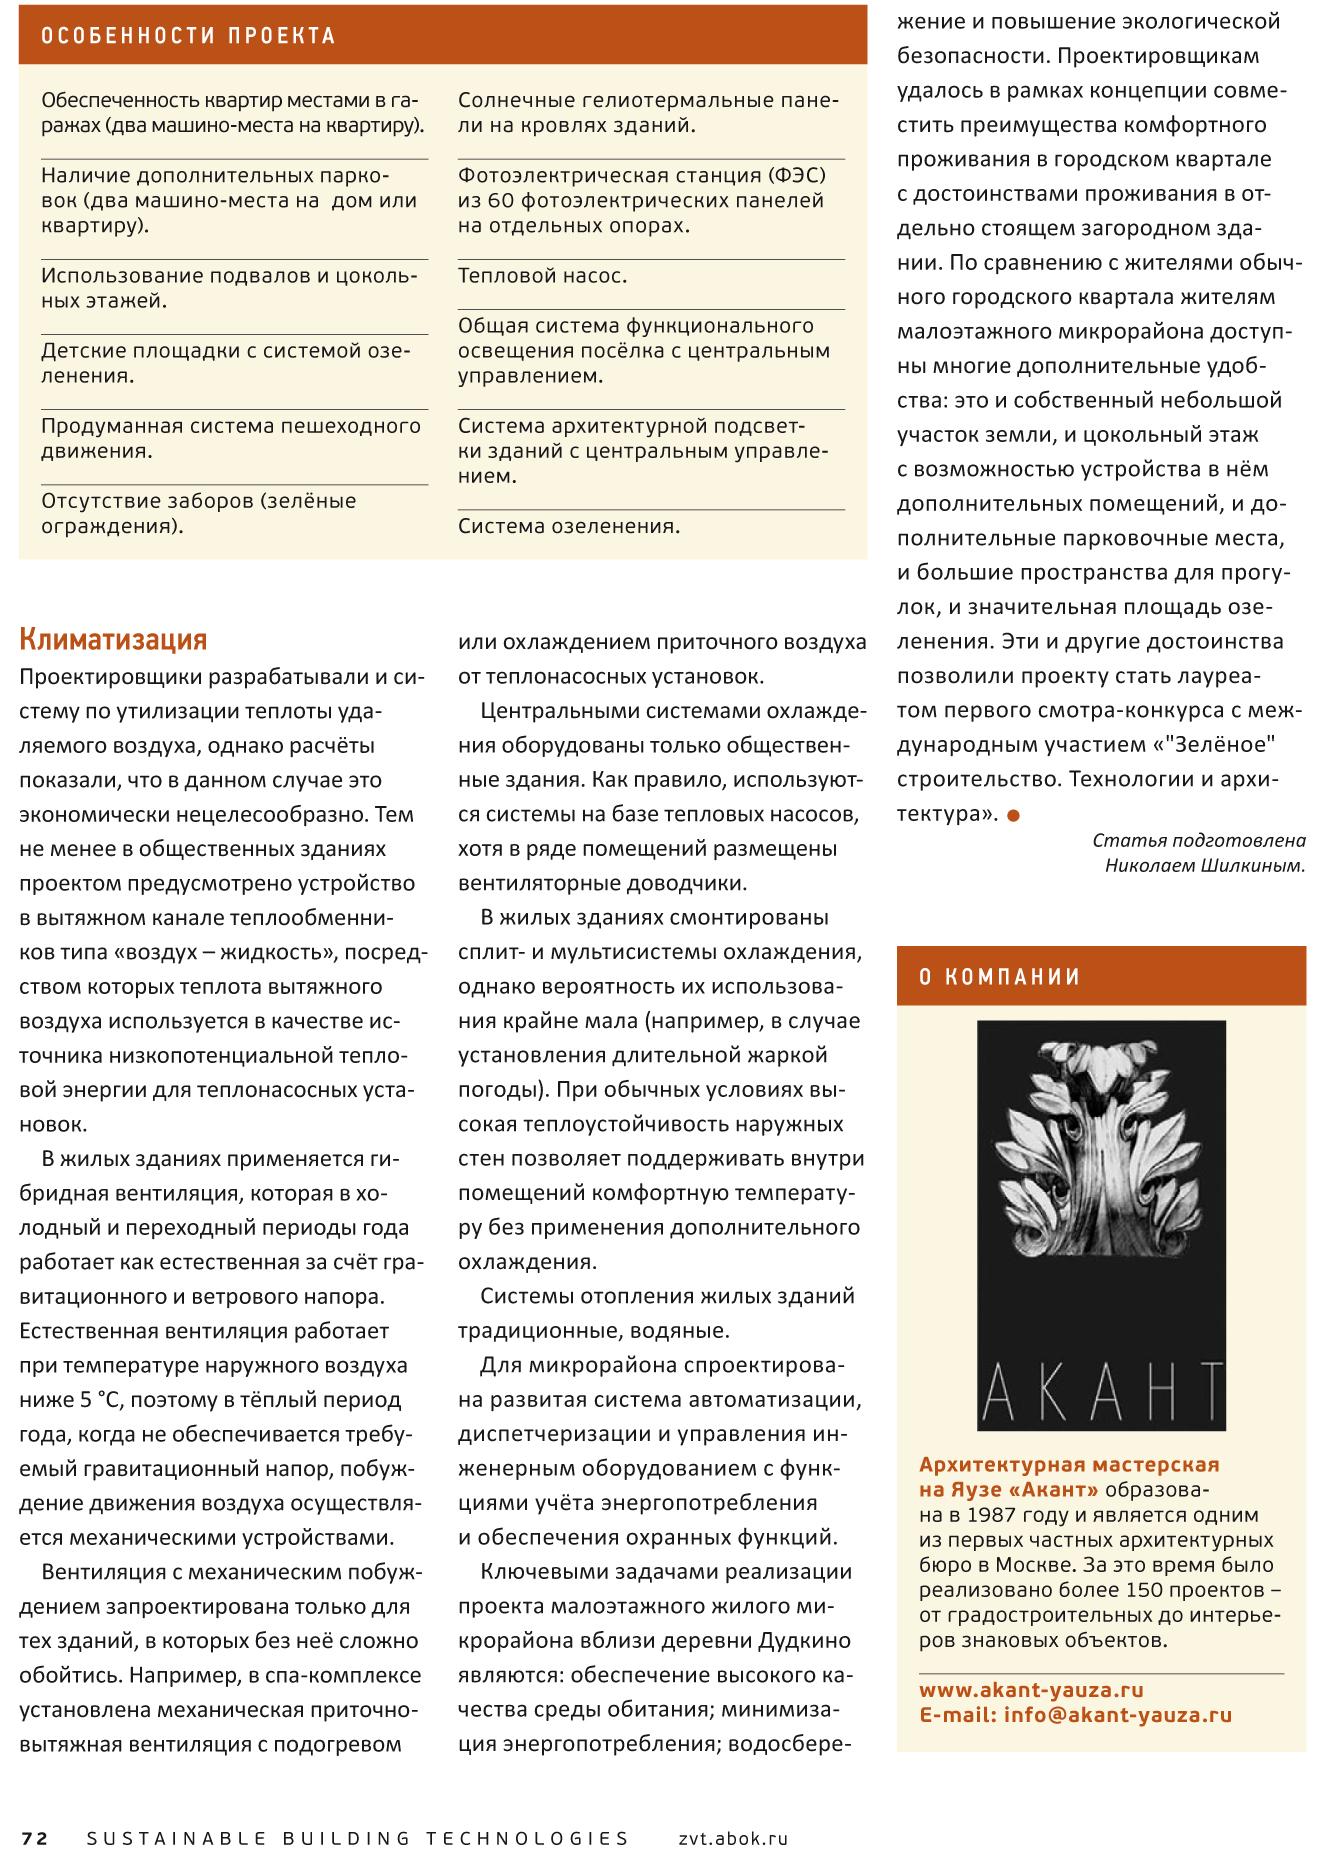 ЗВТ лето 2015 (Дудкино)-11.jpg